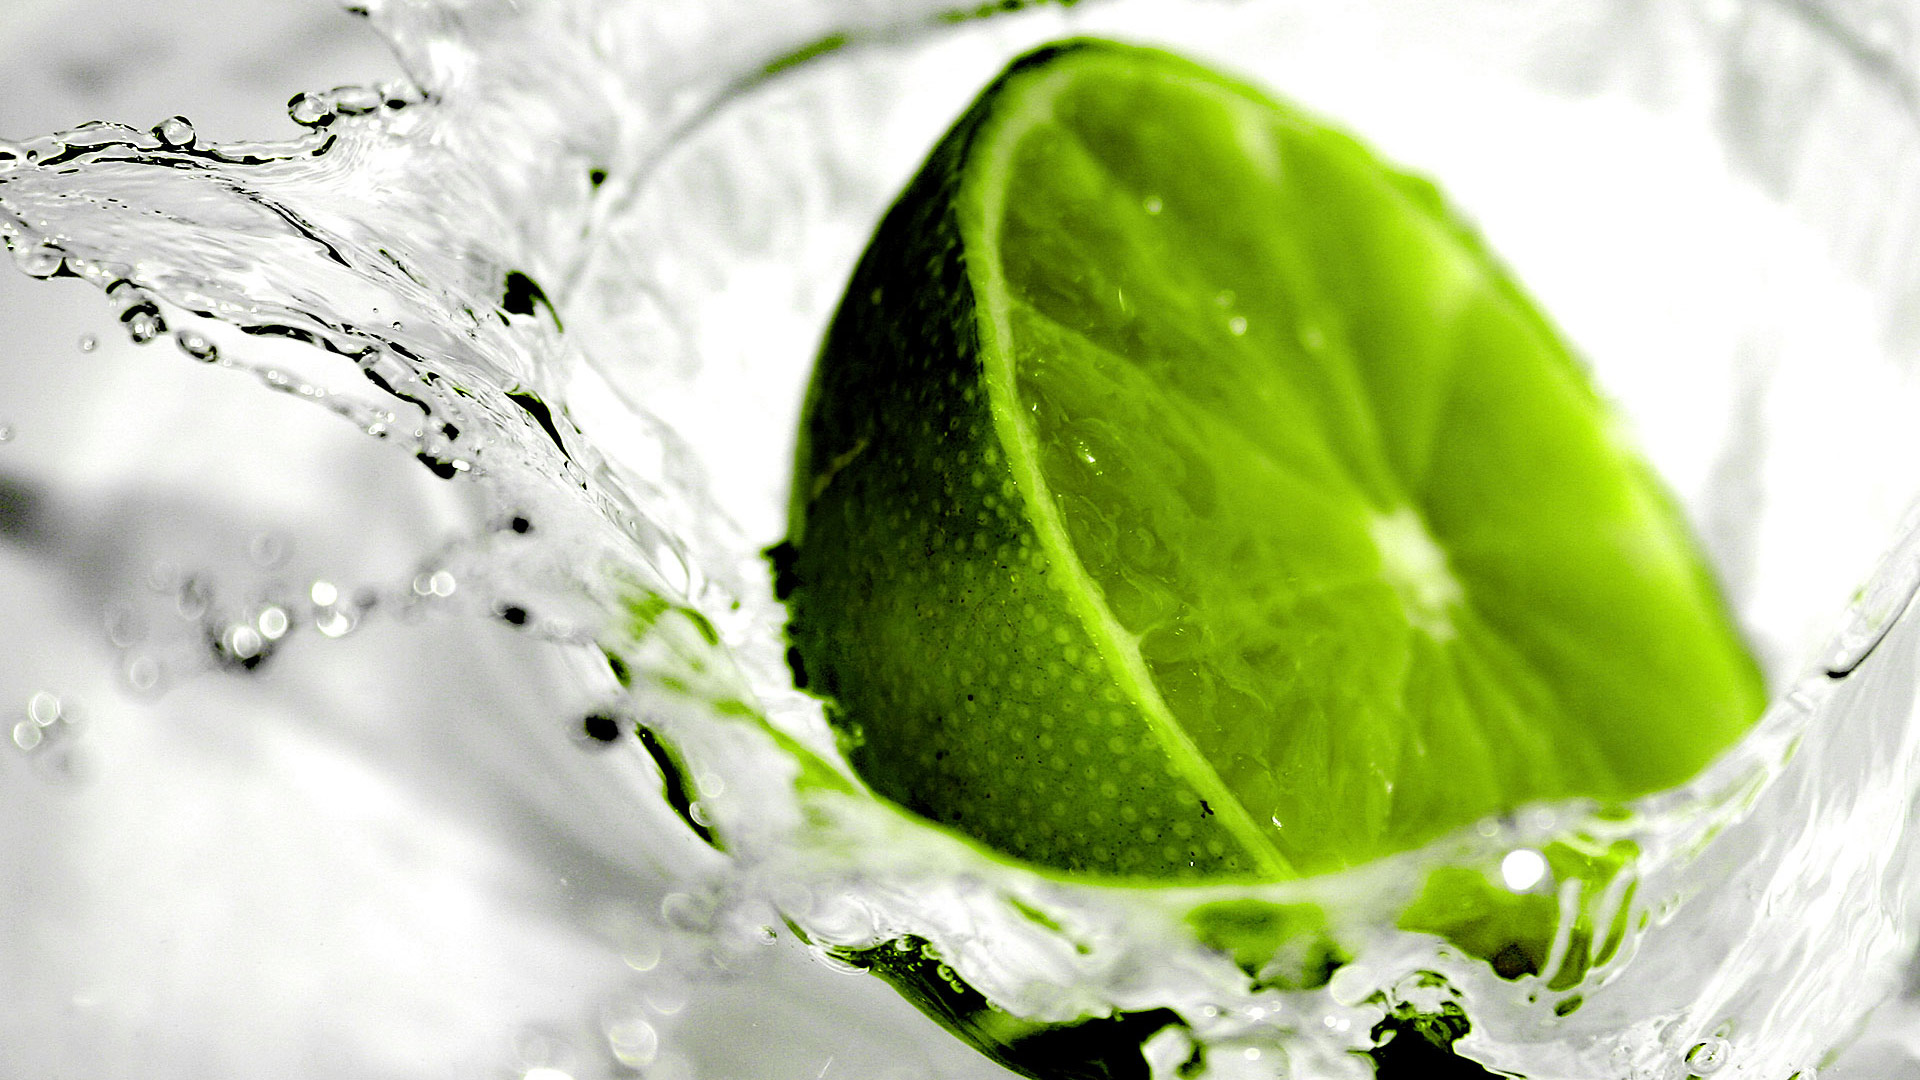 Hd wallpaper green - Hd 1080p Wallpapers Taringa